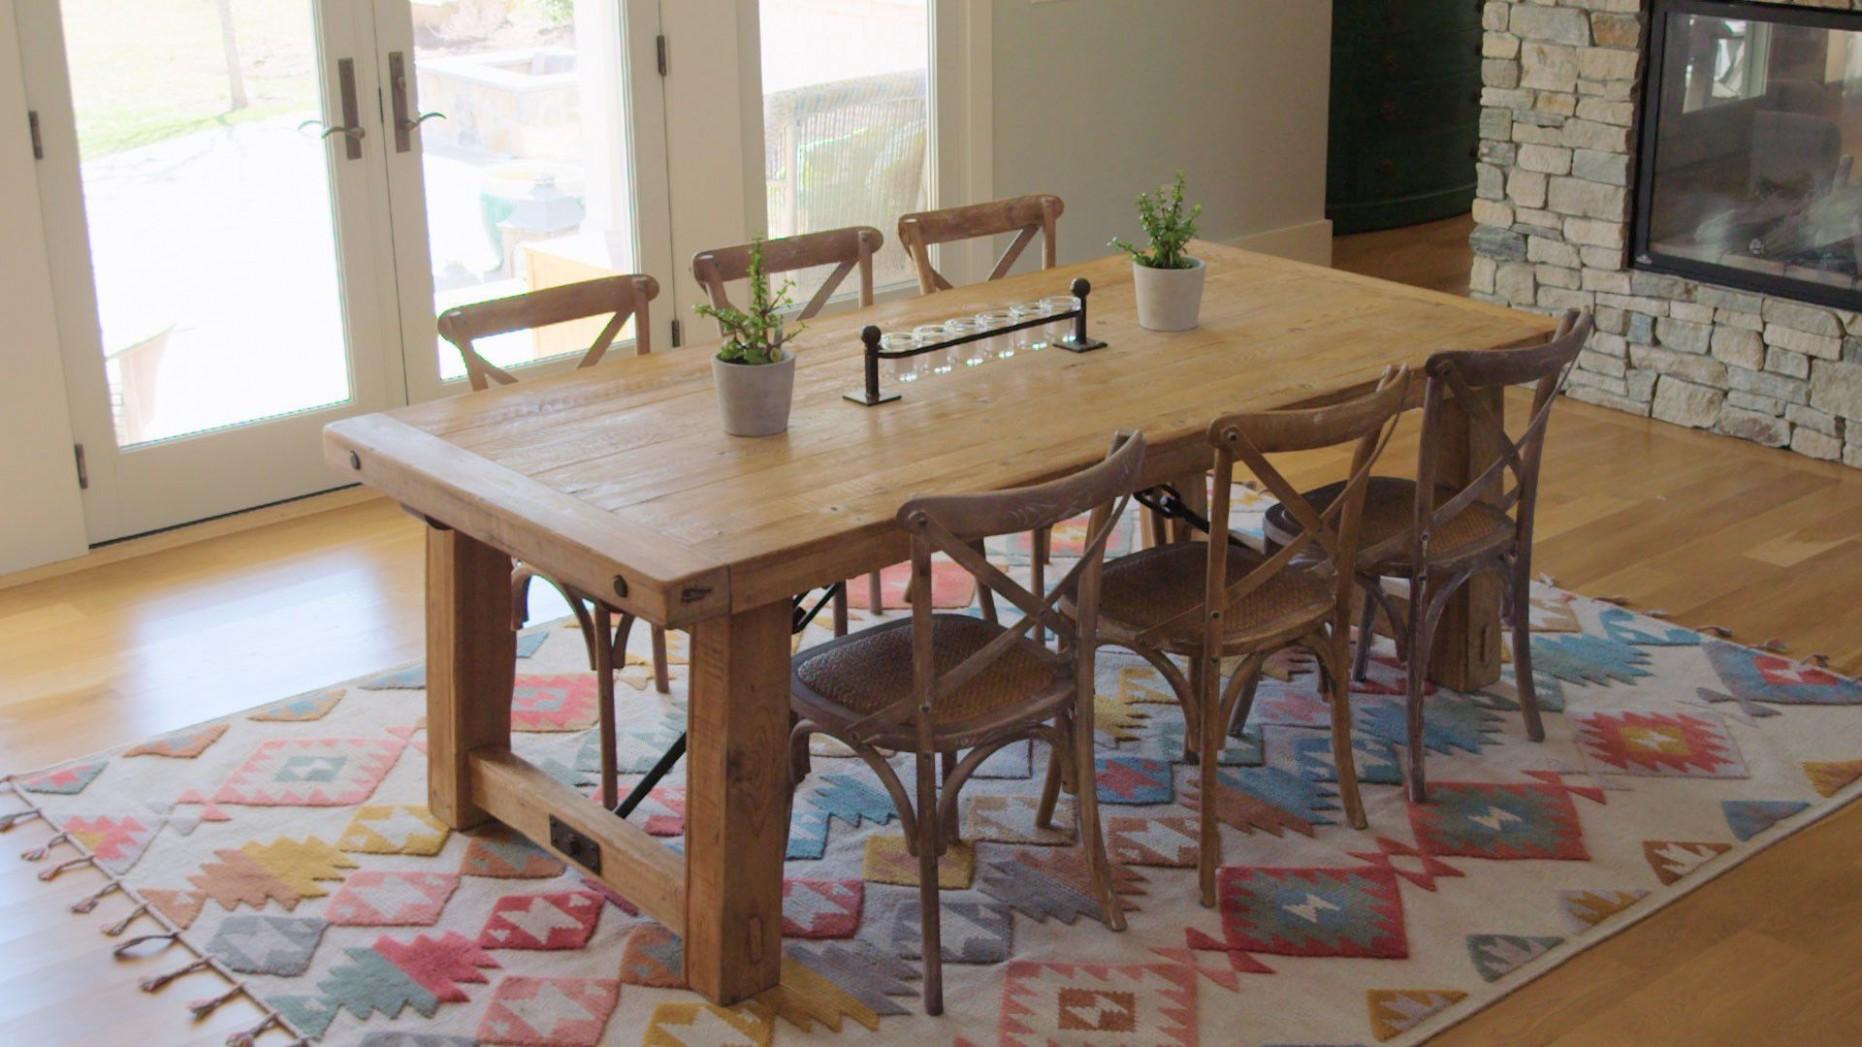 8X8 DINING ROOM DESIGN  Dining room rug, Oak dining table, Rugs  - 12 X 12 Dining Room Ideas